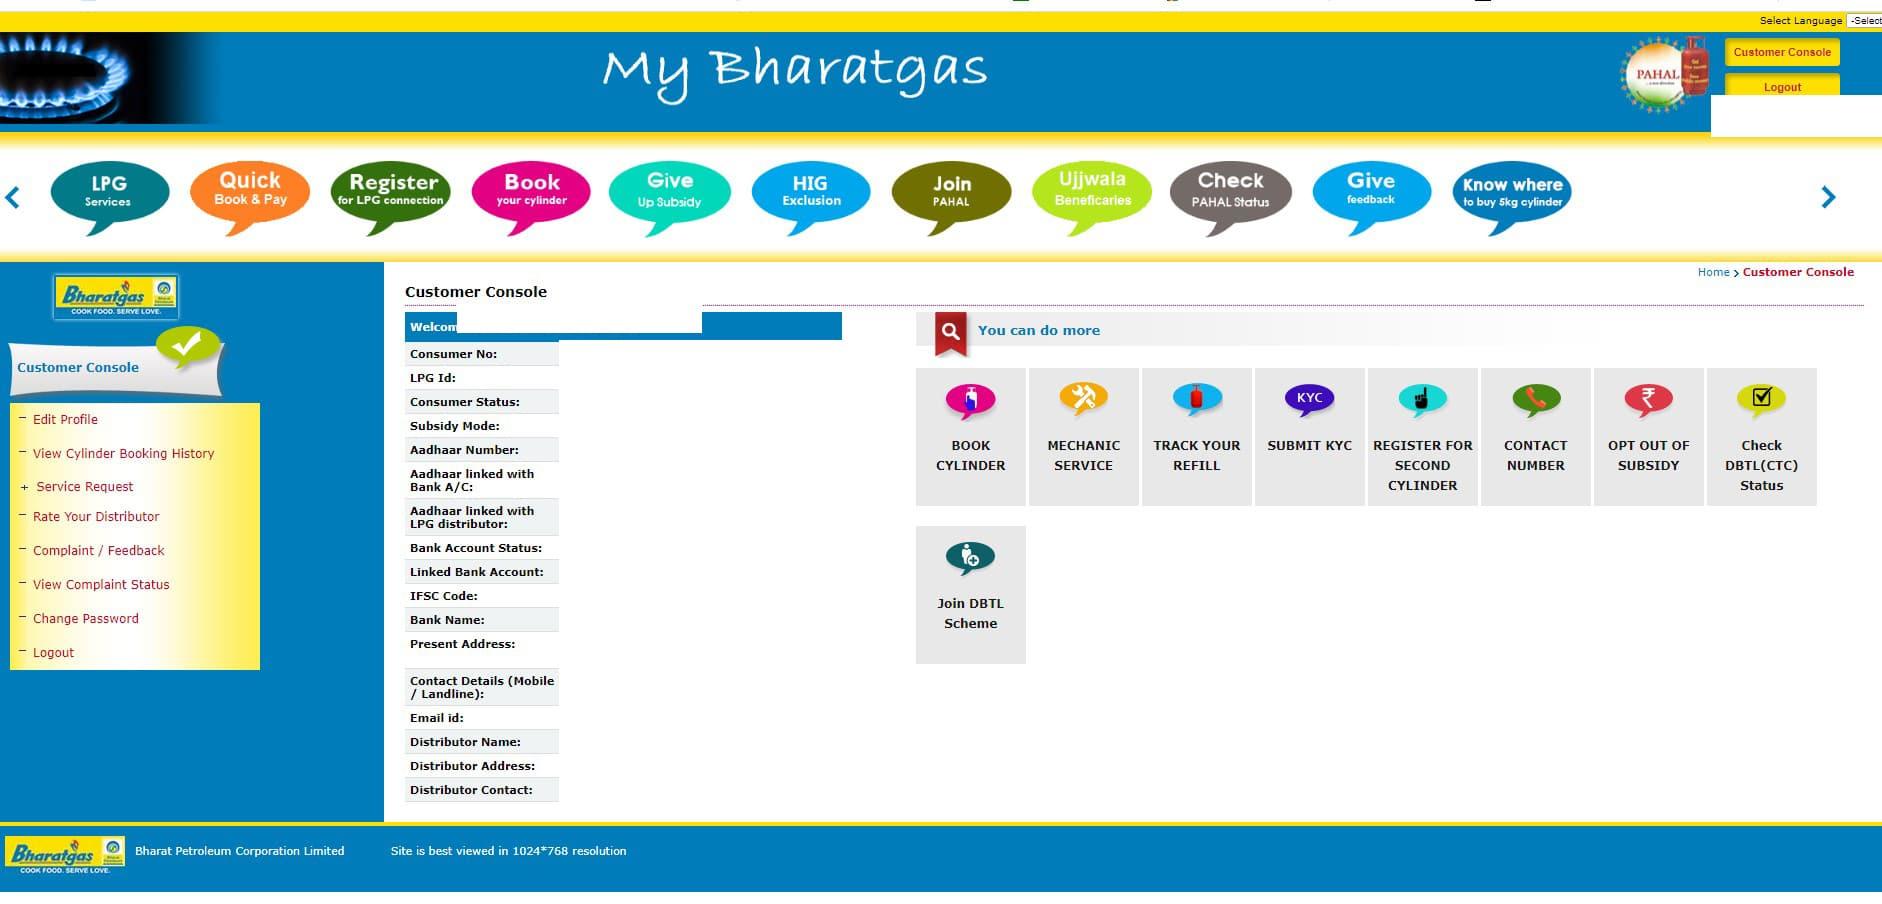 bharat gas dashboard